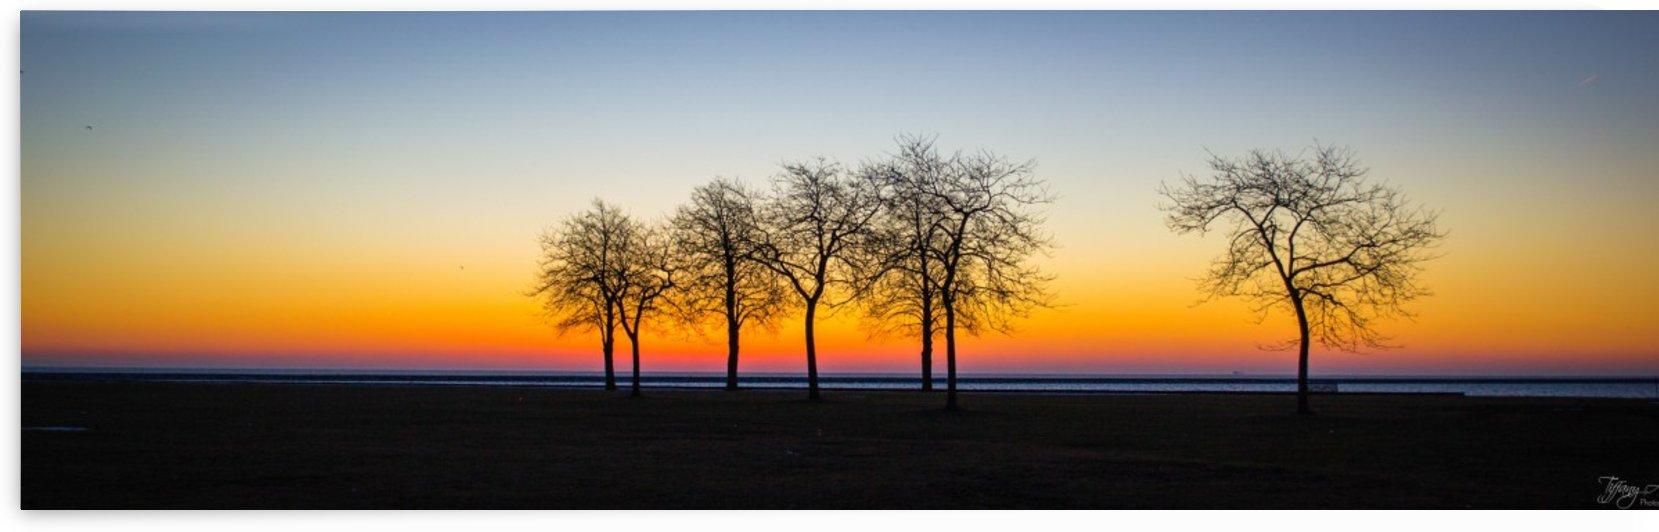 Trees III by Tiffany Ross